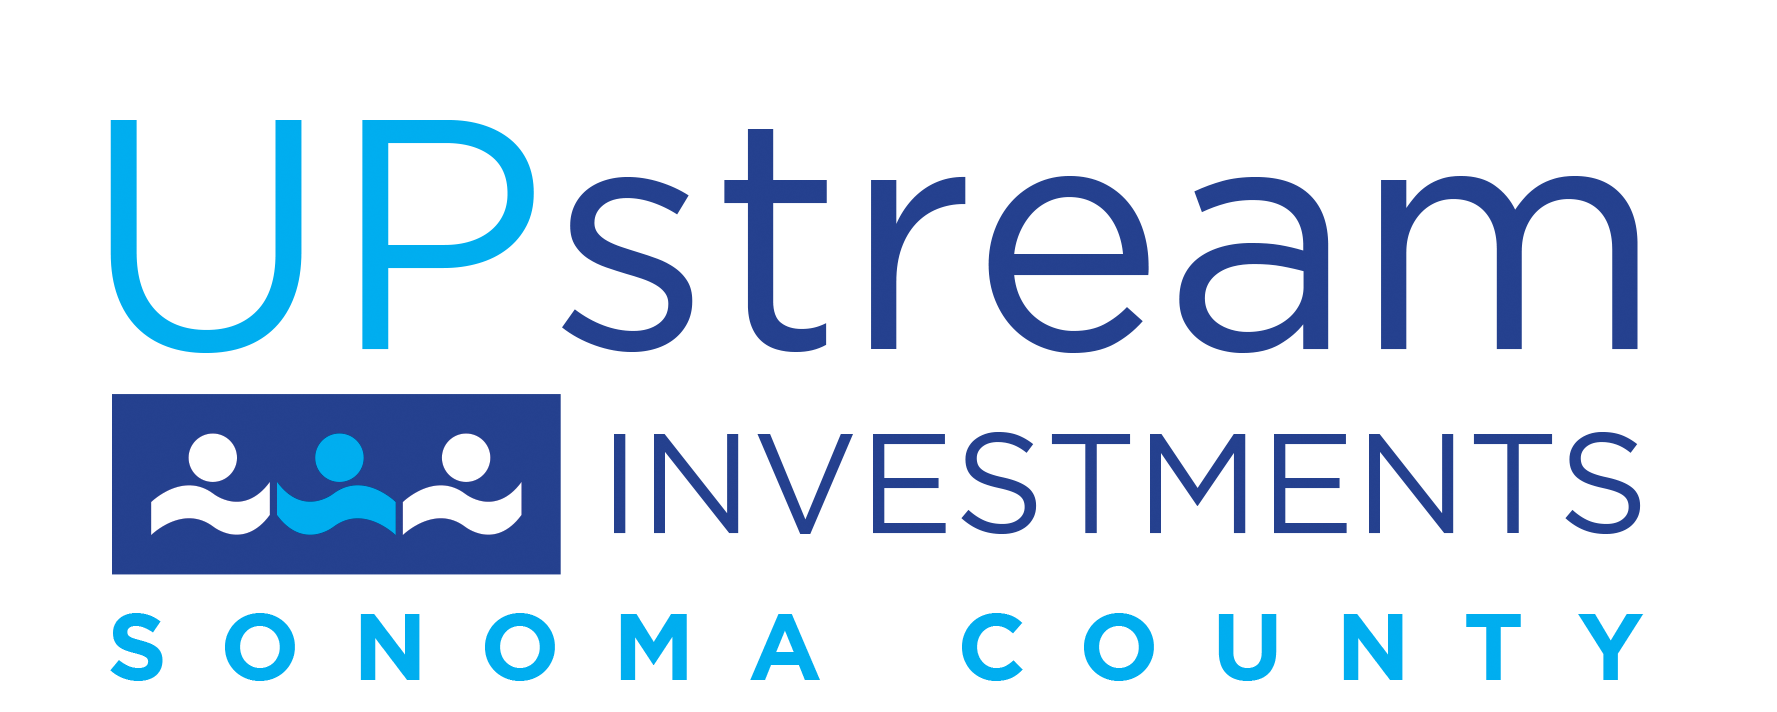 Upstream Investments Logo